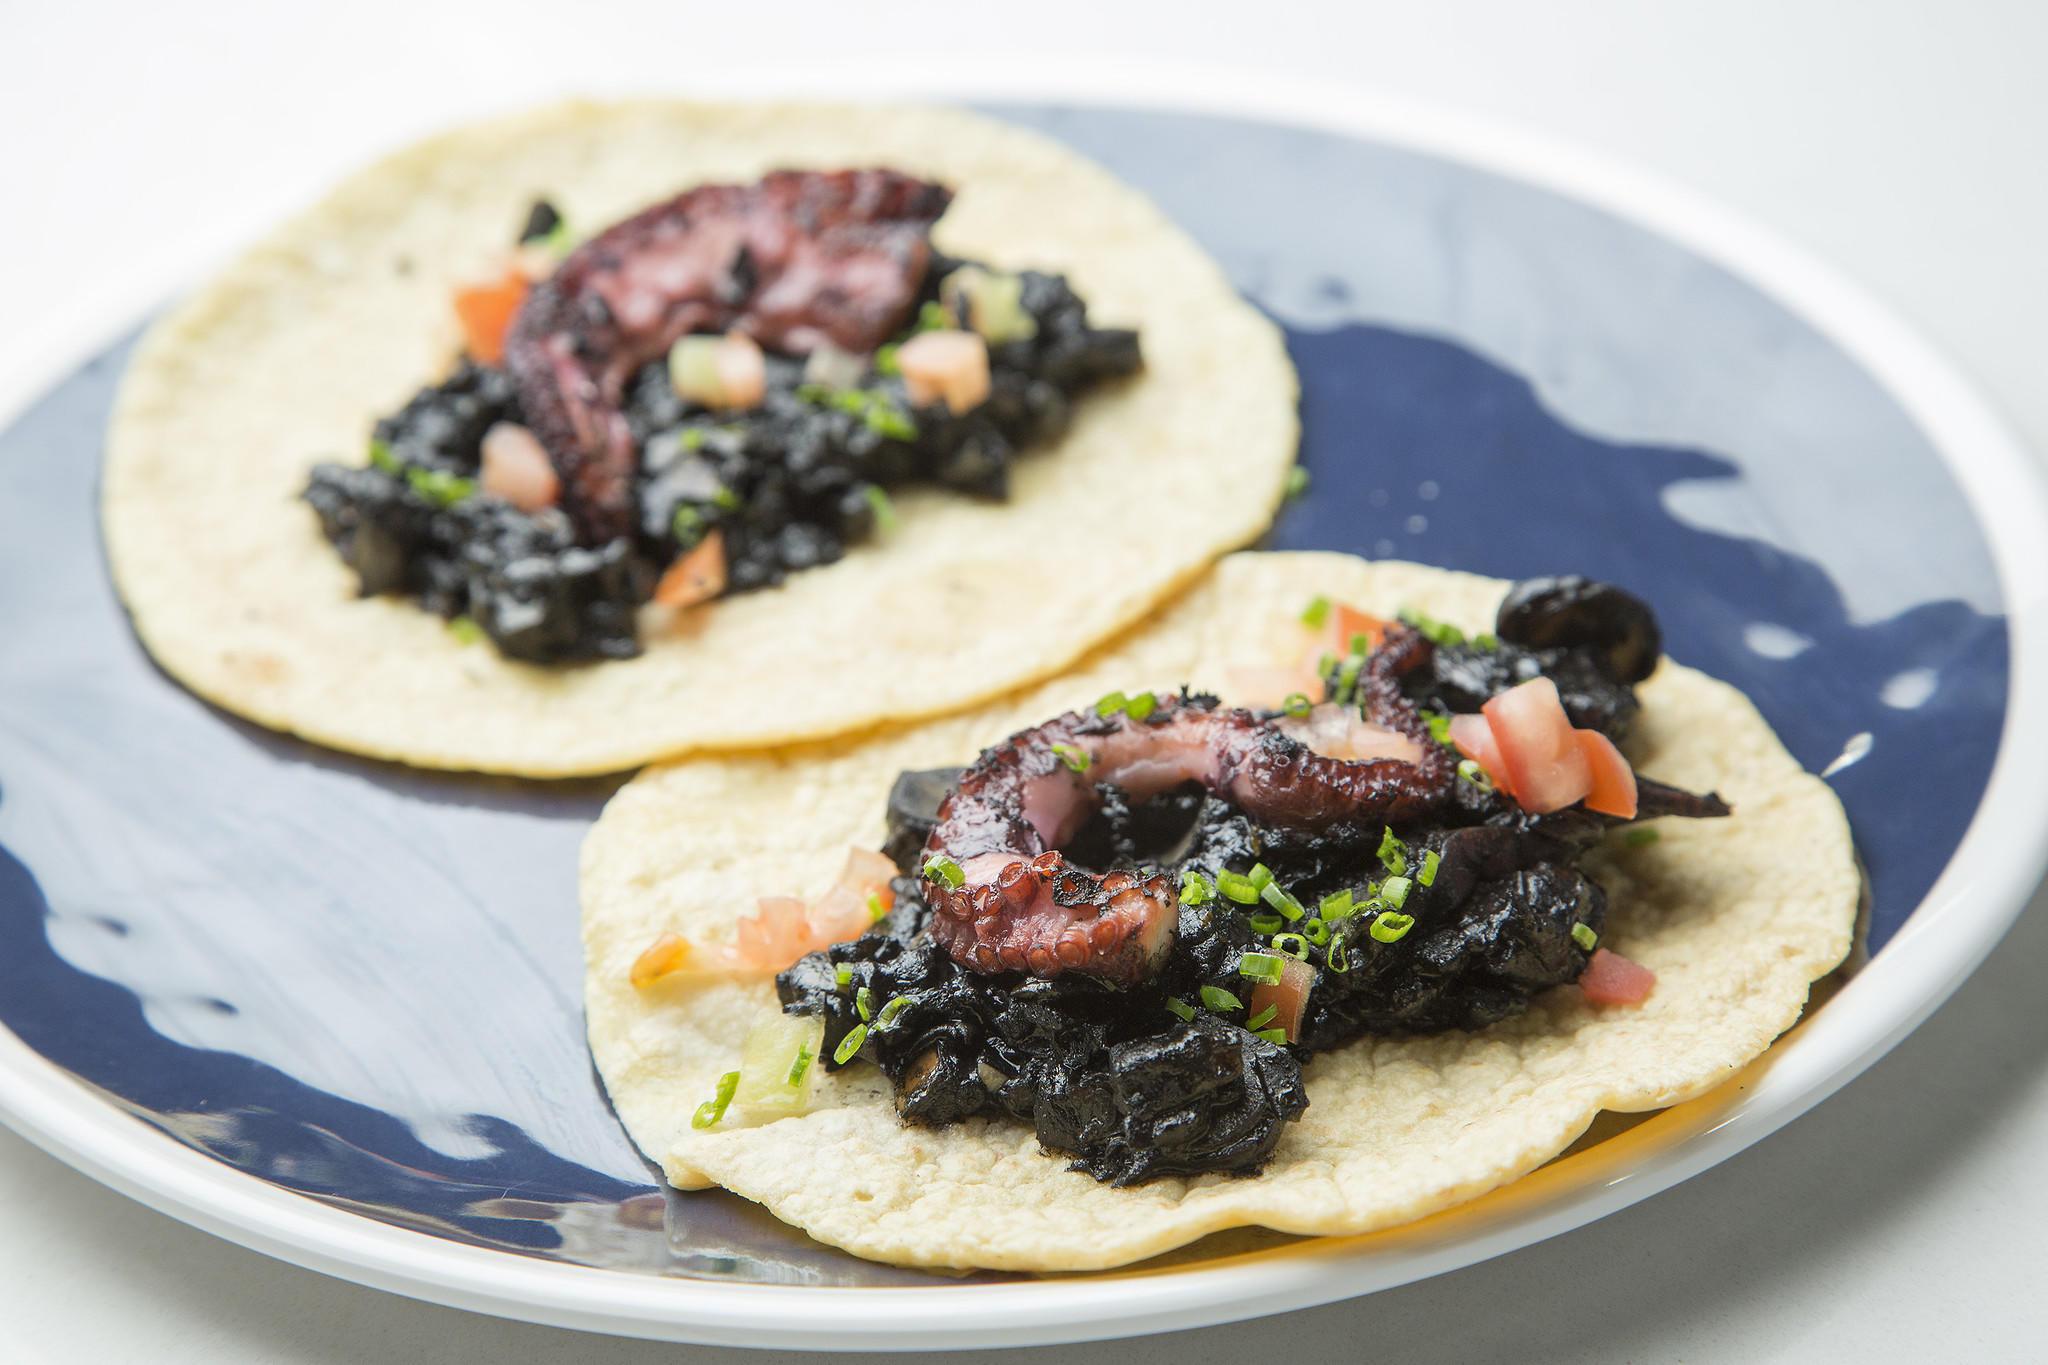 The Yucatán-style seafood menu at Gilberto Cetina Jr.'s Holbox in Mercado La Paloma includes octopus tacos. (Myung J. Chun / Los Angeles Times)